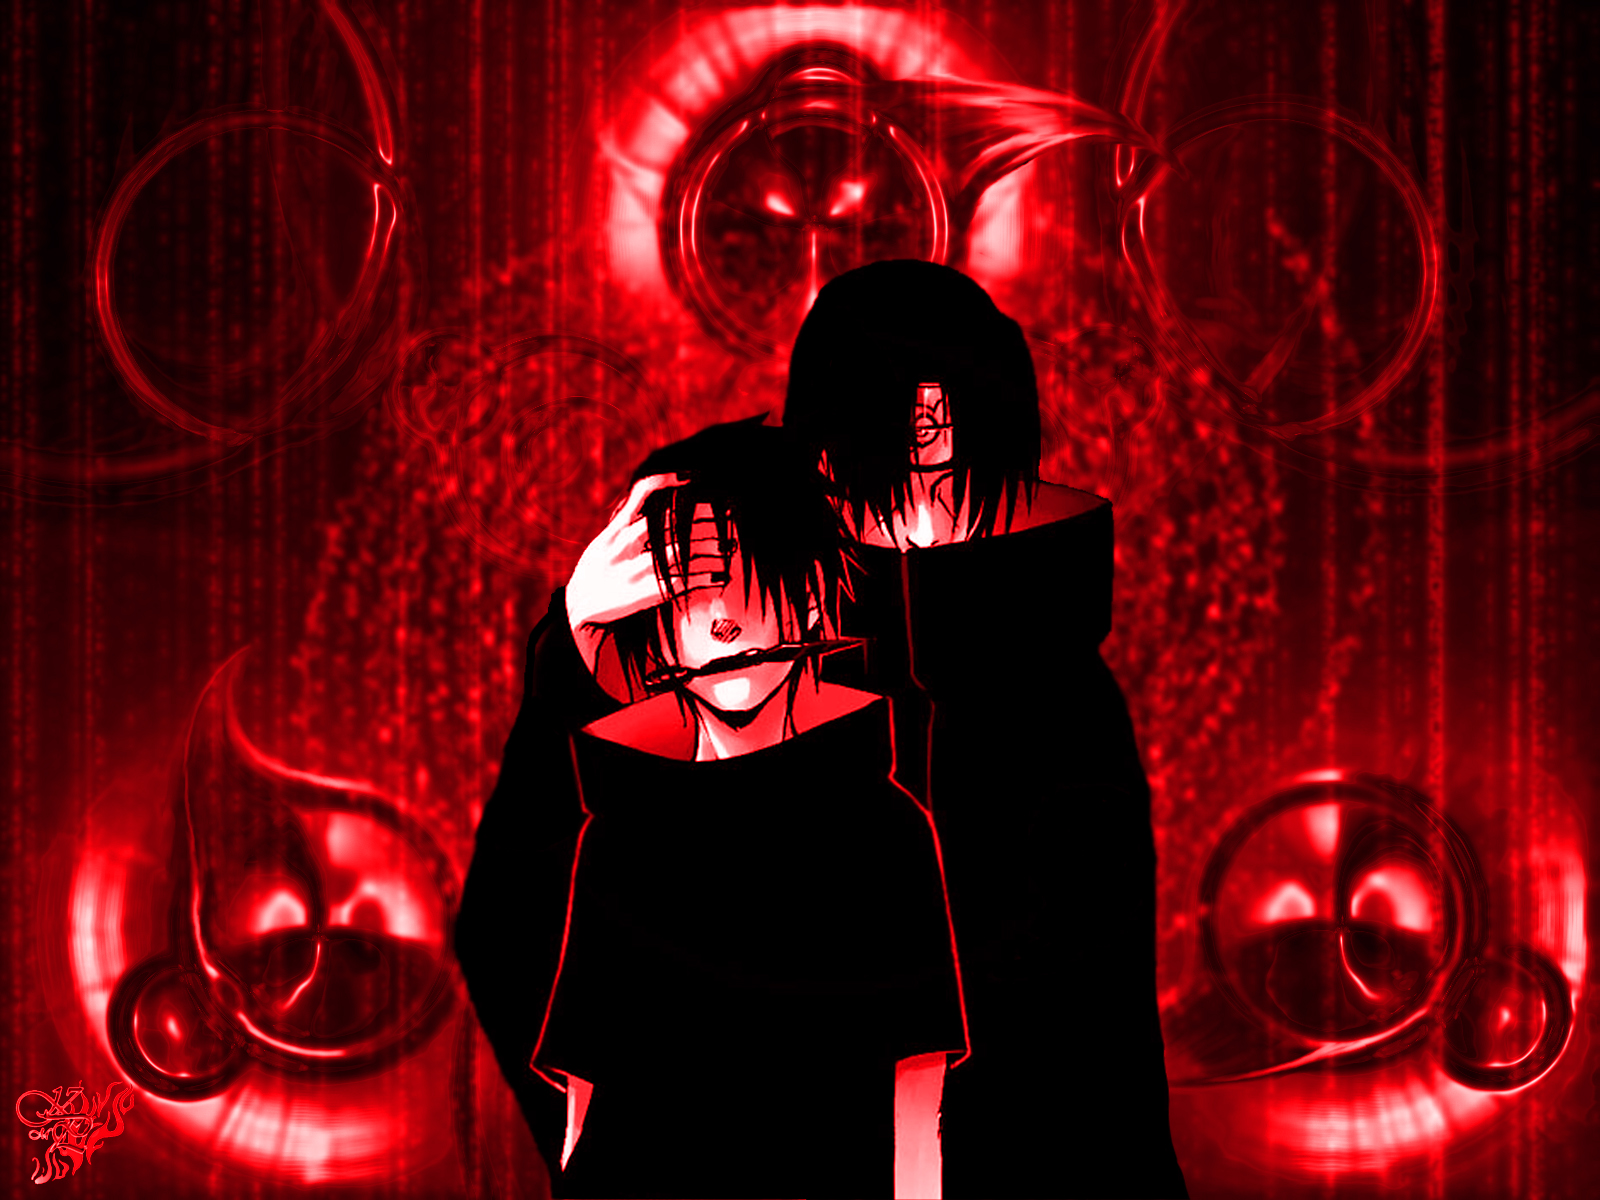 Itachi And Sasuke Wallpaper HD wallpaper   Itachi And Sasuke Wallpaper 1600x1200